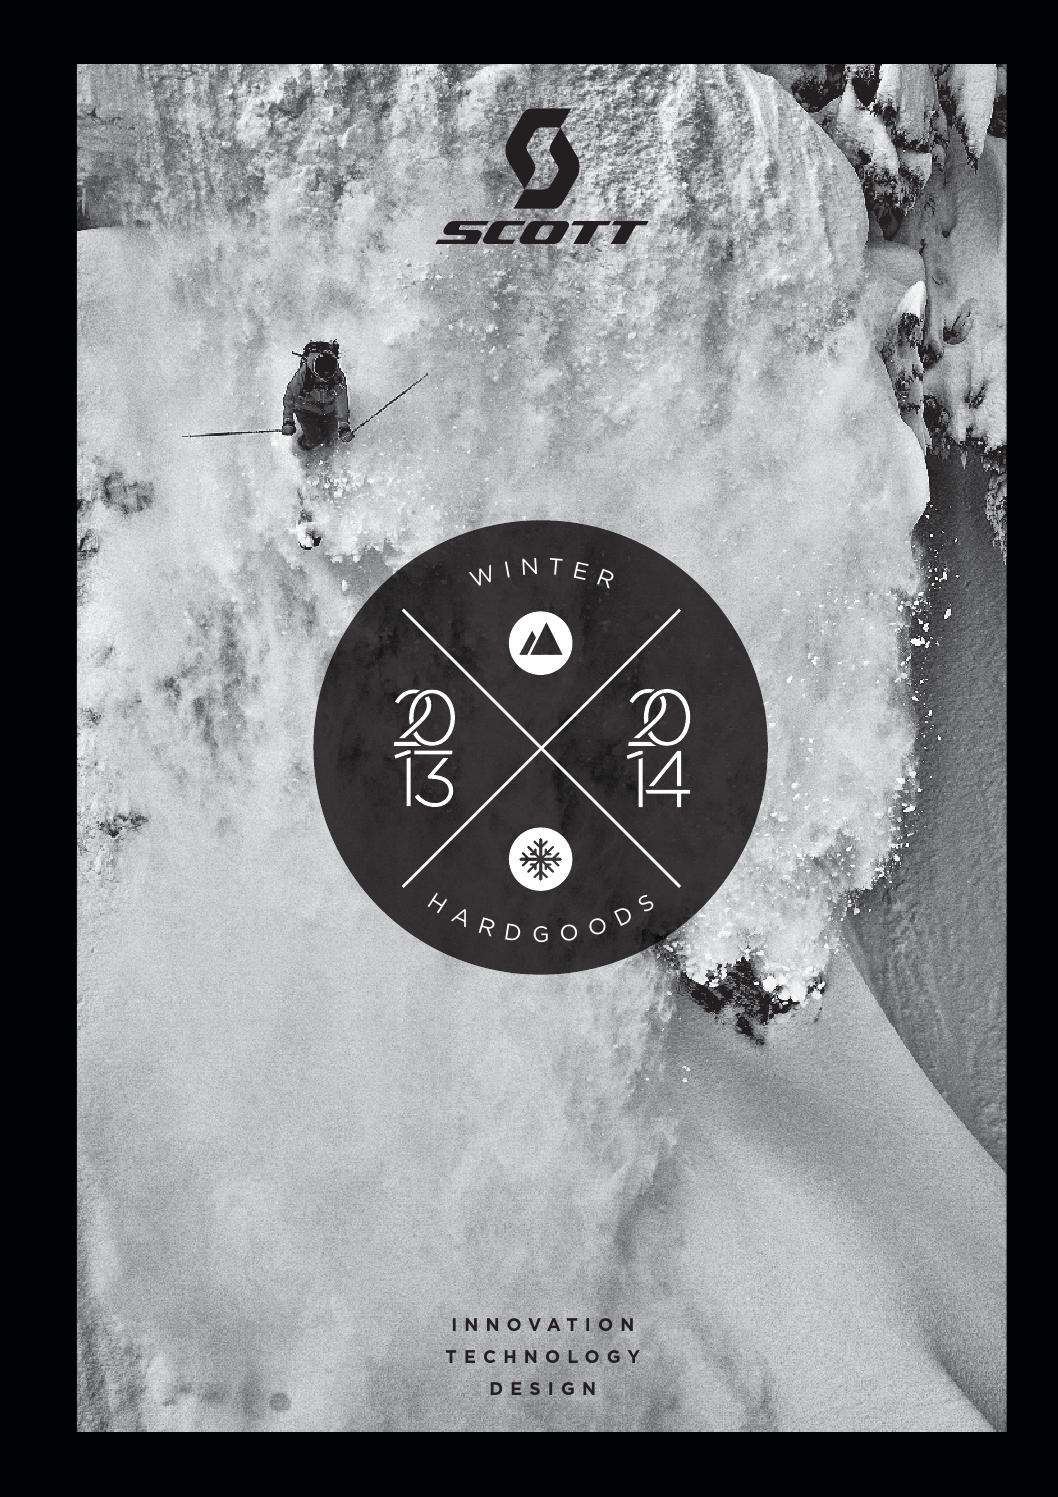 0b3ce352706a Scott Sports 1314 Wintersport Hardgoods Catalog by Mica Sport Canada ...